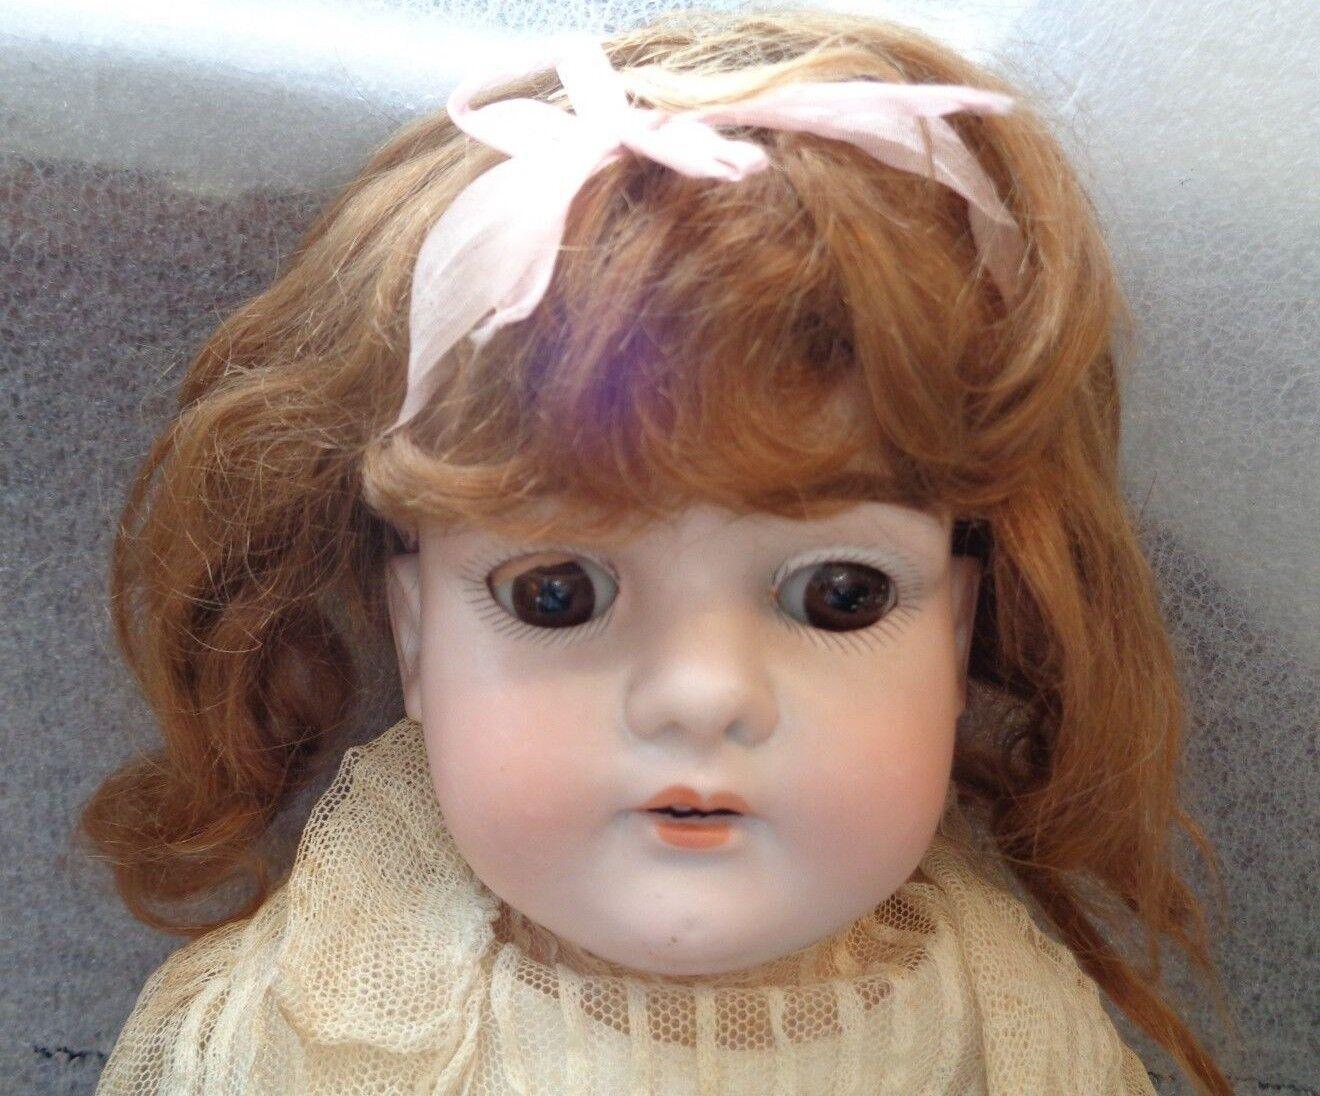 Antique German bisque head girl sleeper eye doll marked L.H.B.